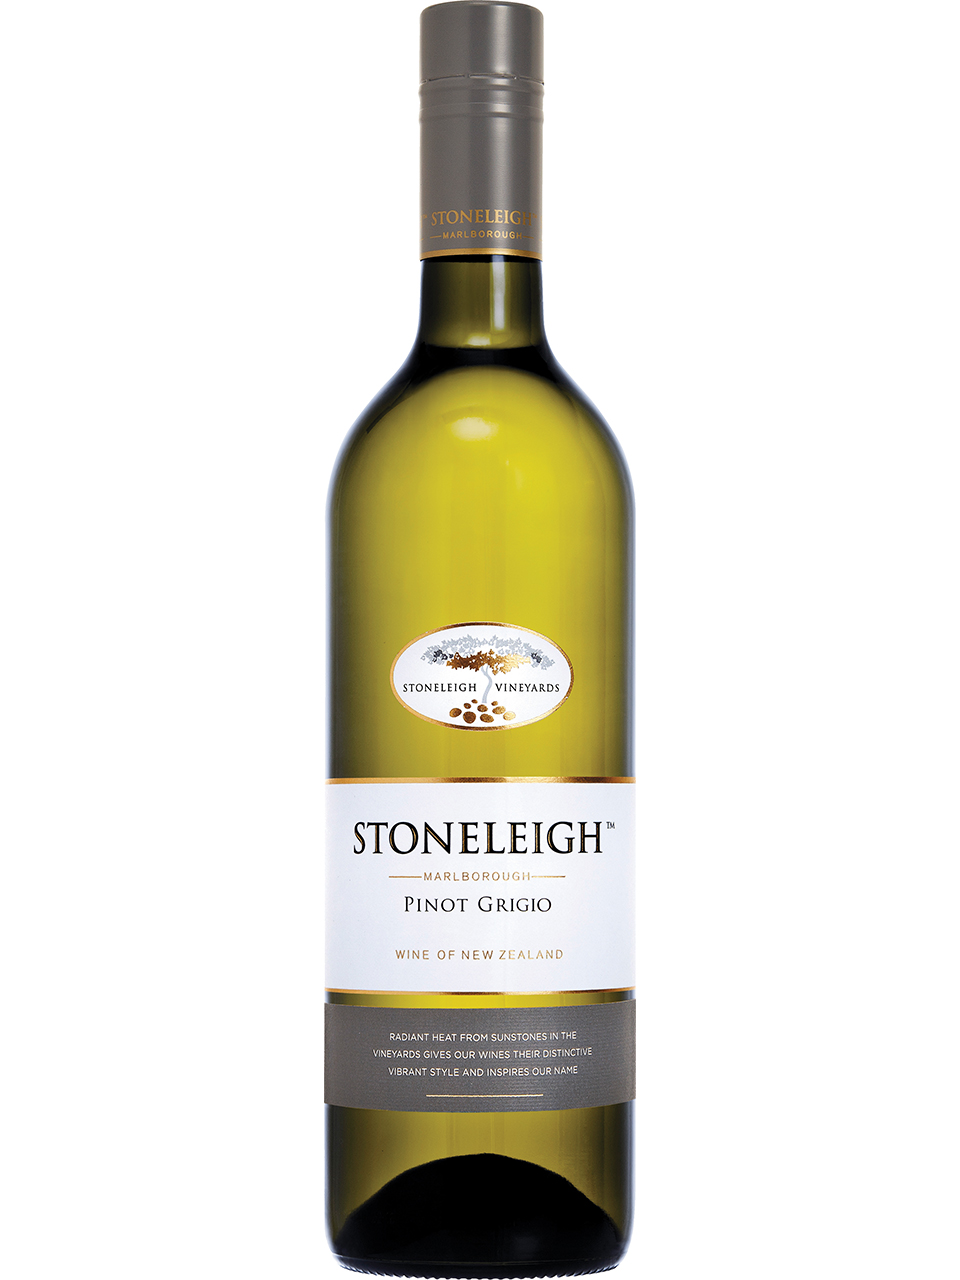 Stoneleigh Marlborough Pinot Grigio